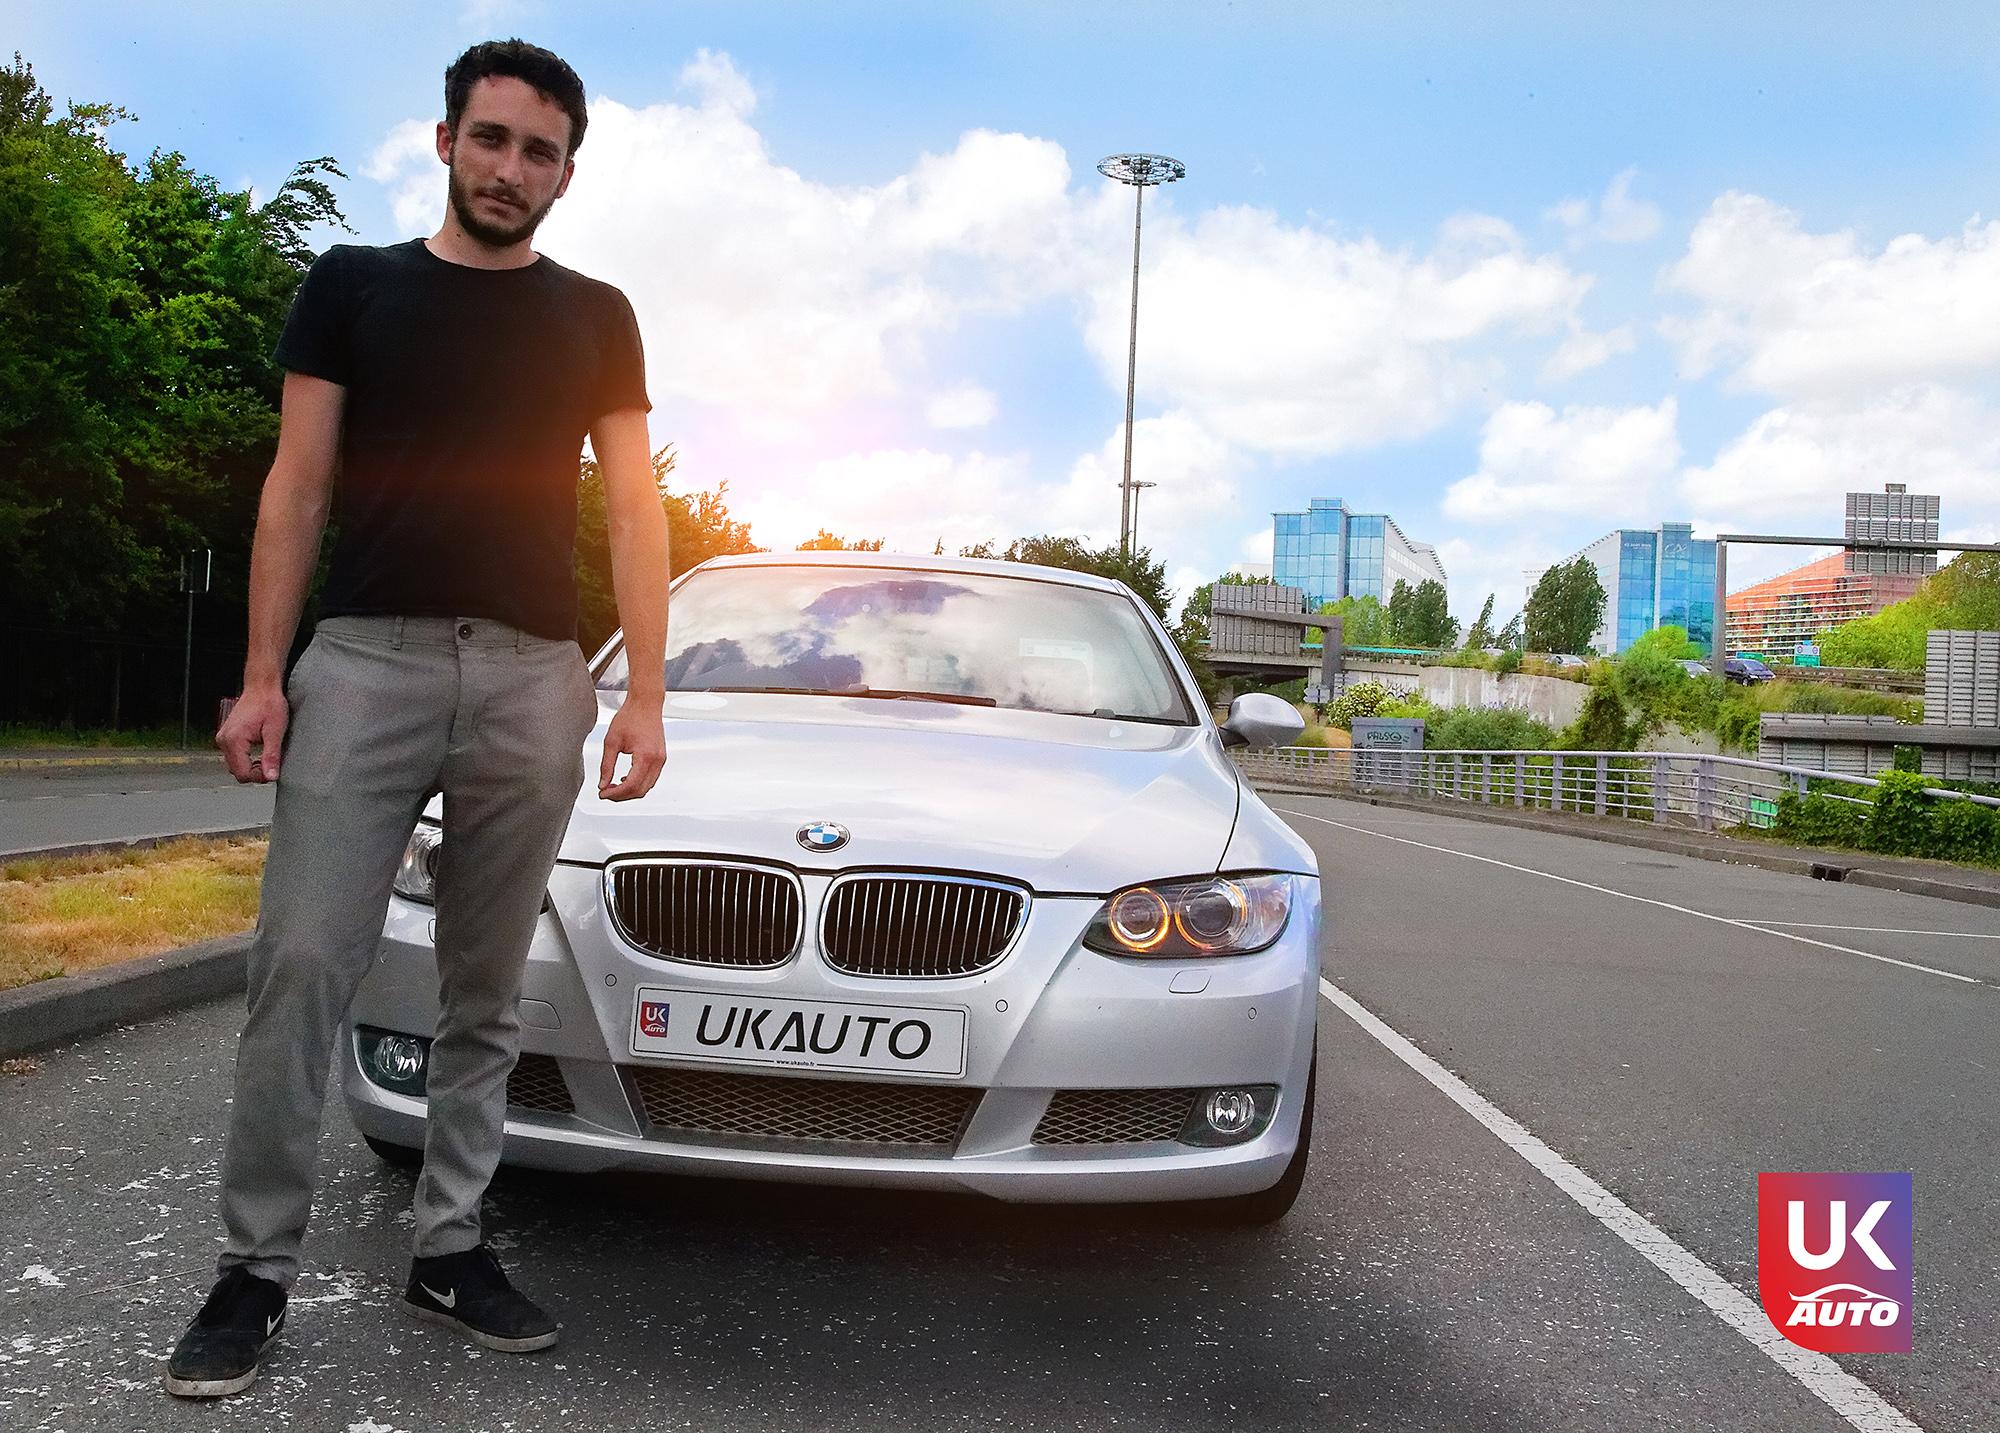 Bmw 335i rhd import uk bmw occasion bmw mandataire e92 rhd coupe uk auto uk ukauto14 - Felecitation a Julien pour cette BMW 335i E92 COUPE RHD importateur voitures anglaises